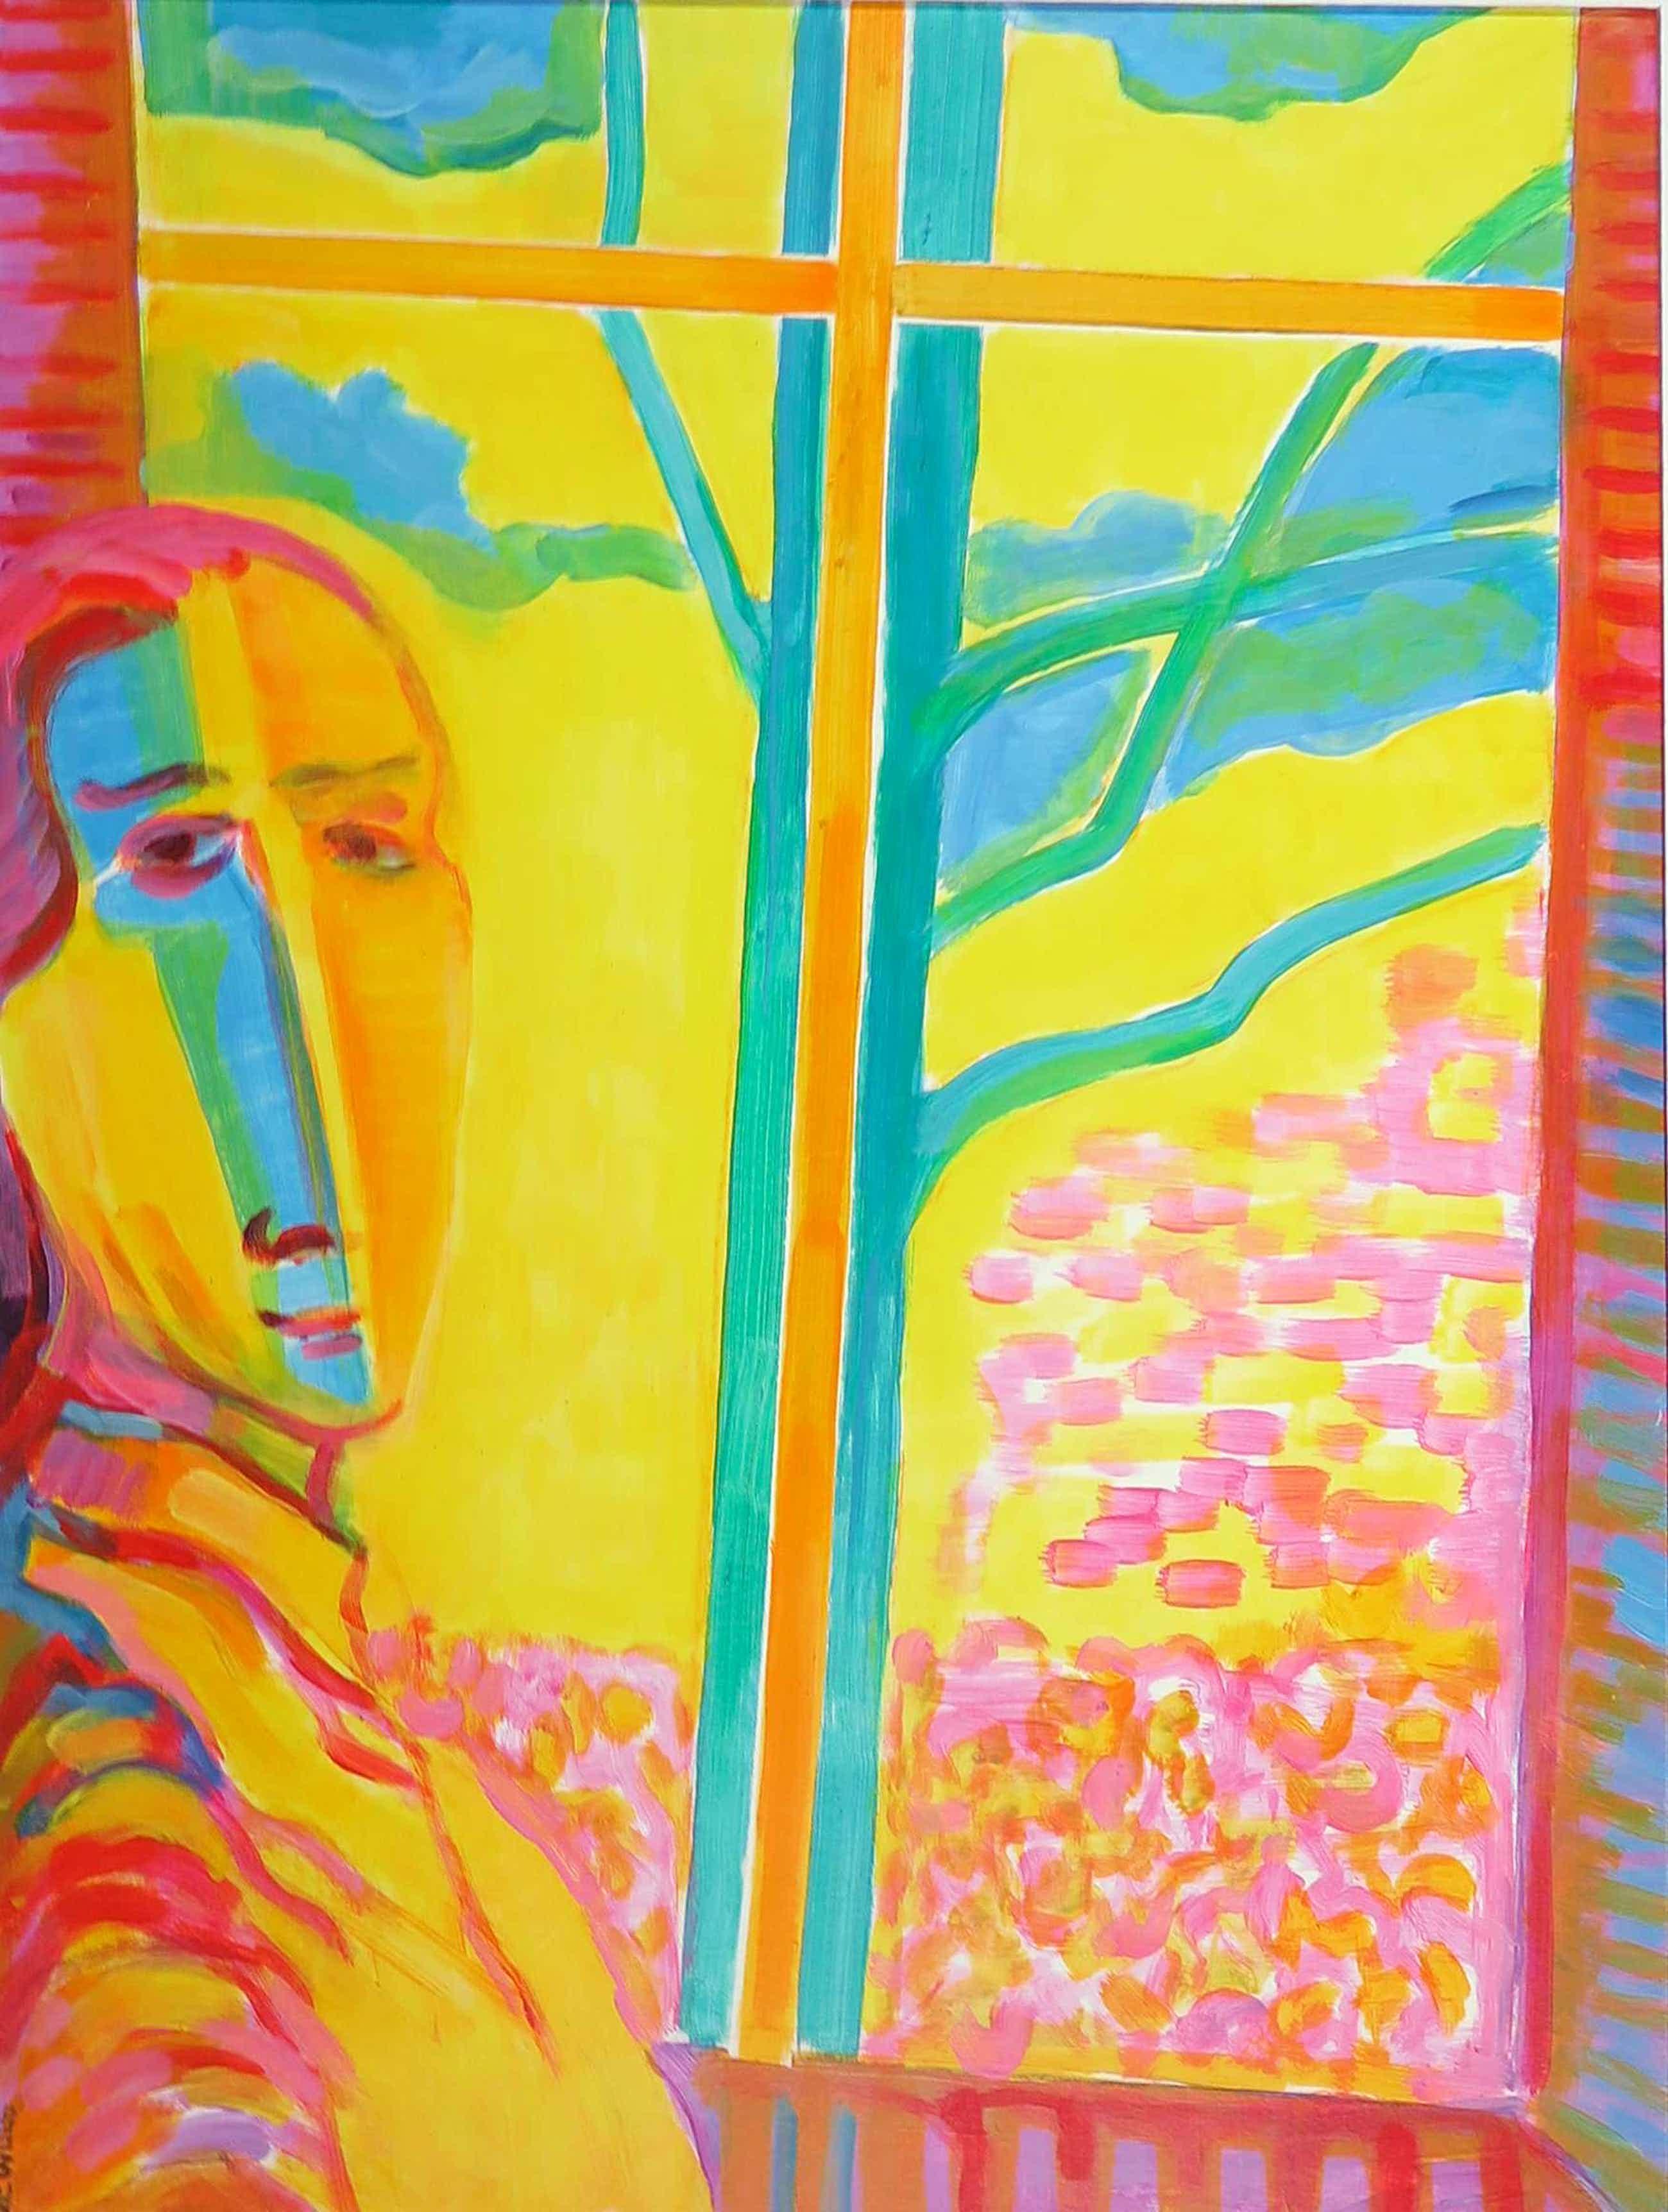 Joe Wols - Acryl op papier, Spring garden kopen? Bied vanaf 35!